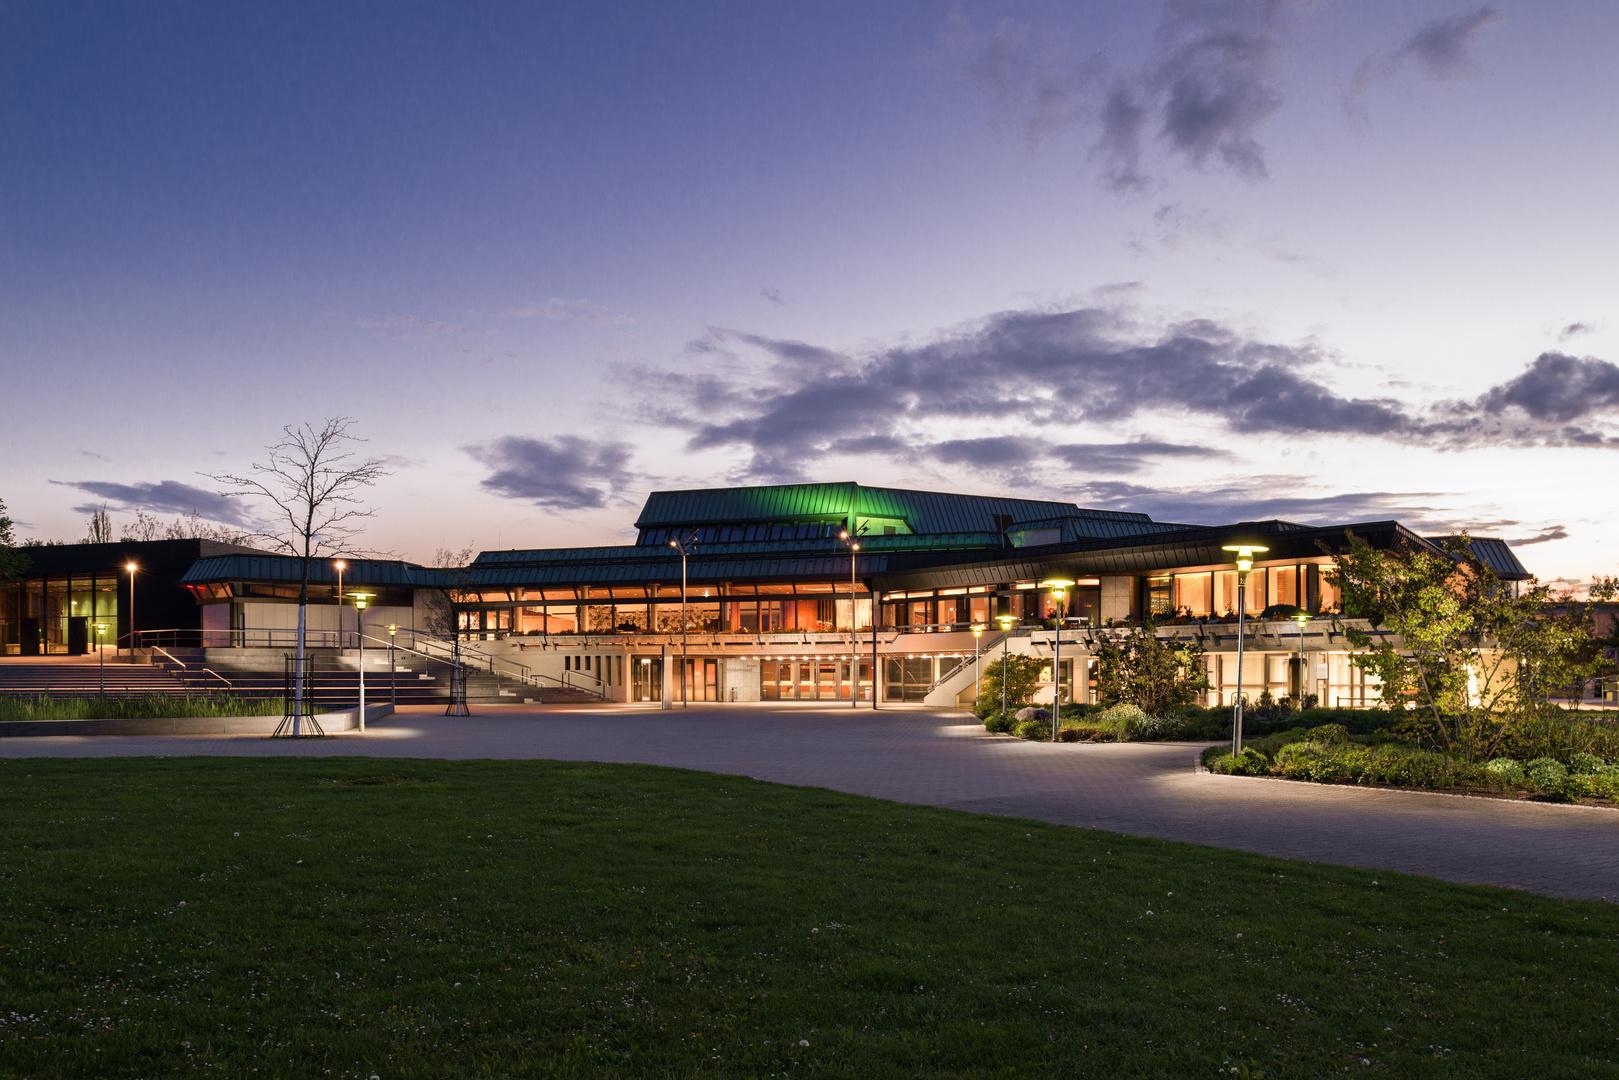 Schwabenlandhalle Fellbach